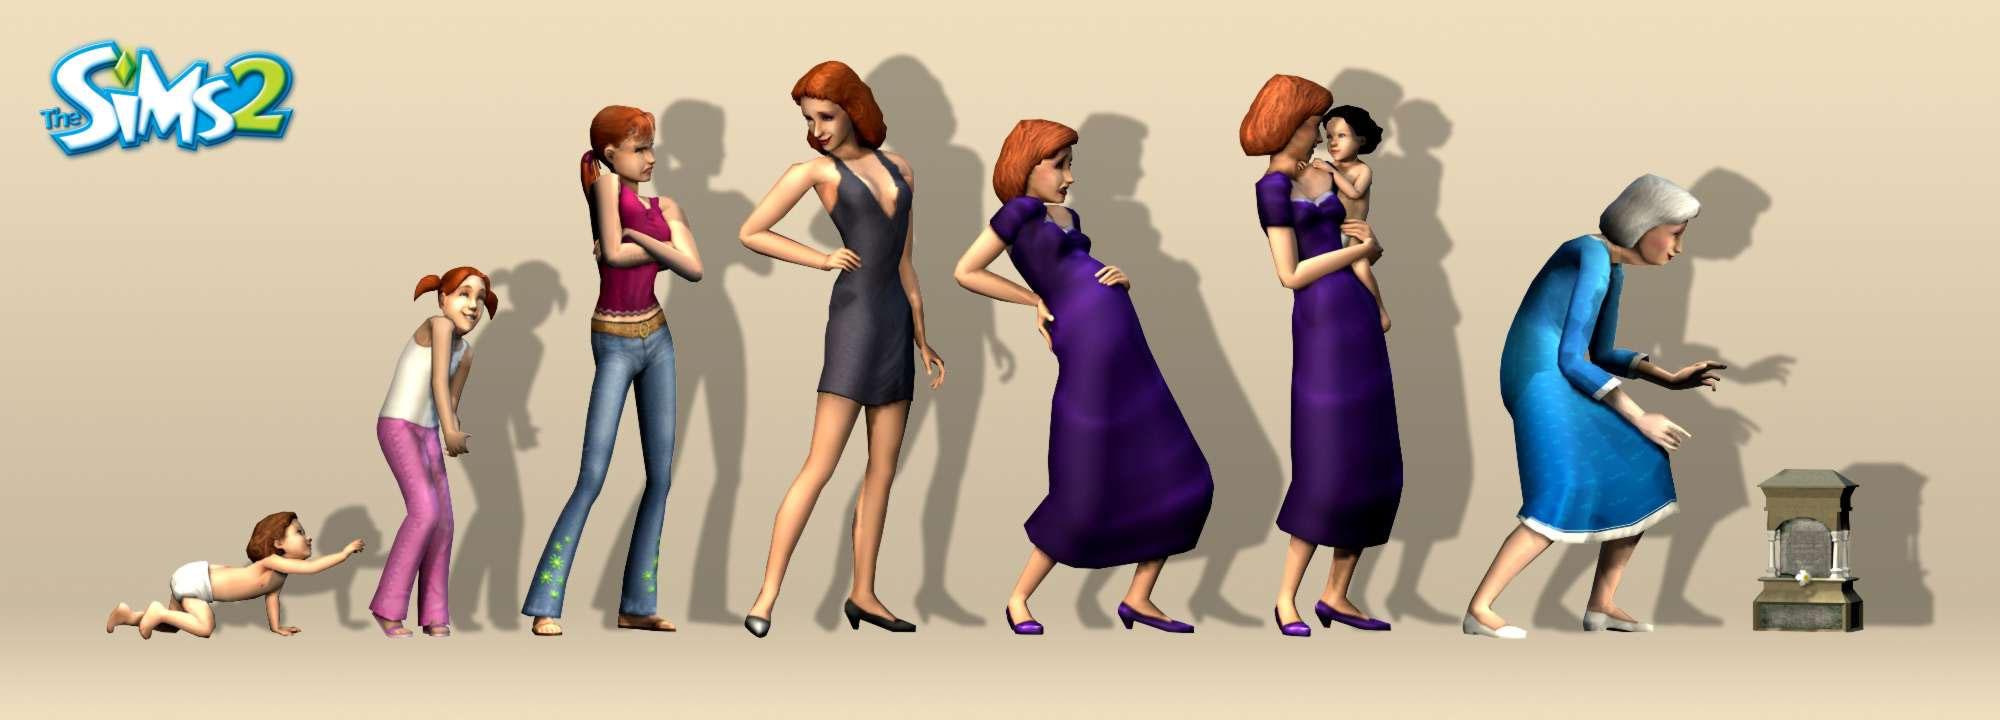 oslava narozenin hry The Sims 2 CZ   recenze   Games.cz oslava narozenin hry